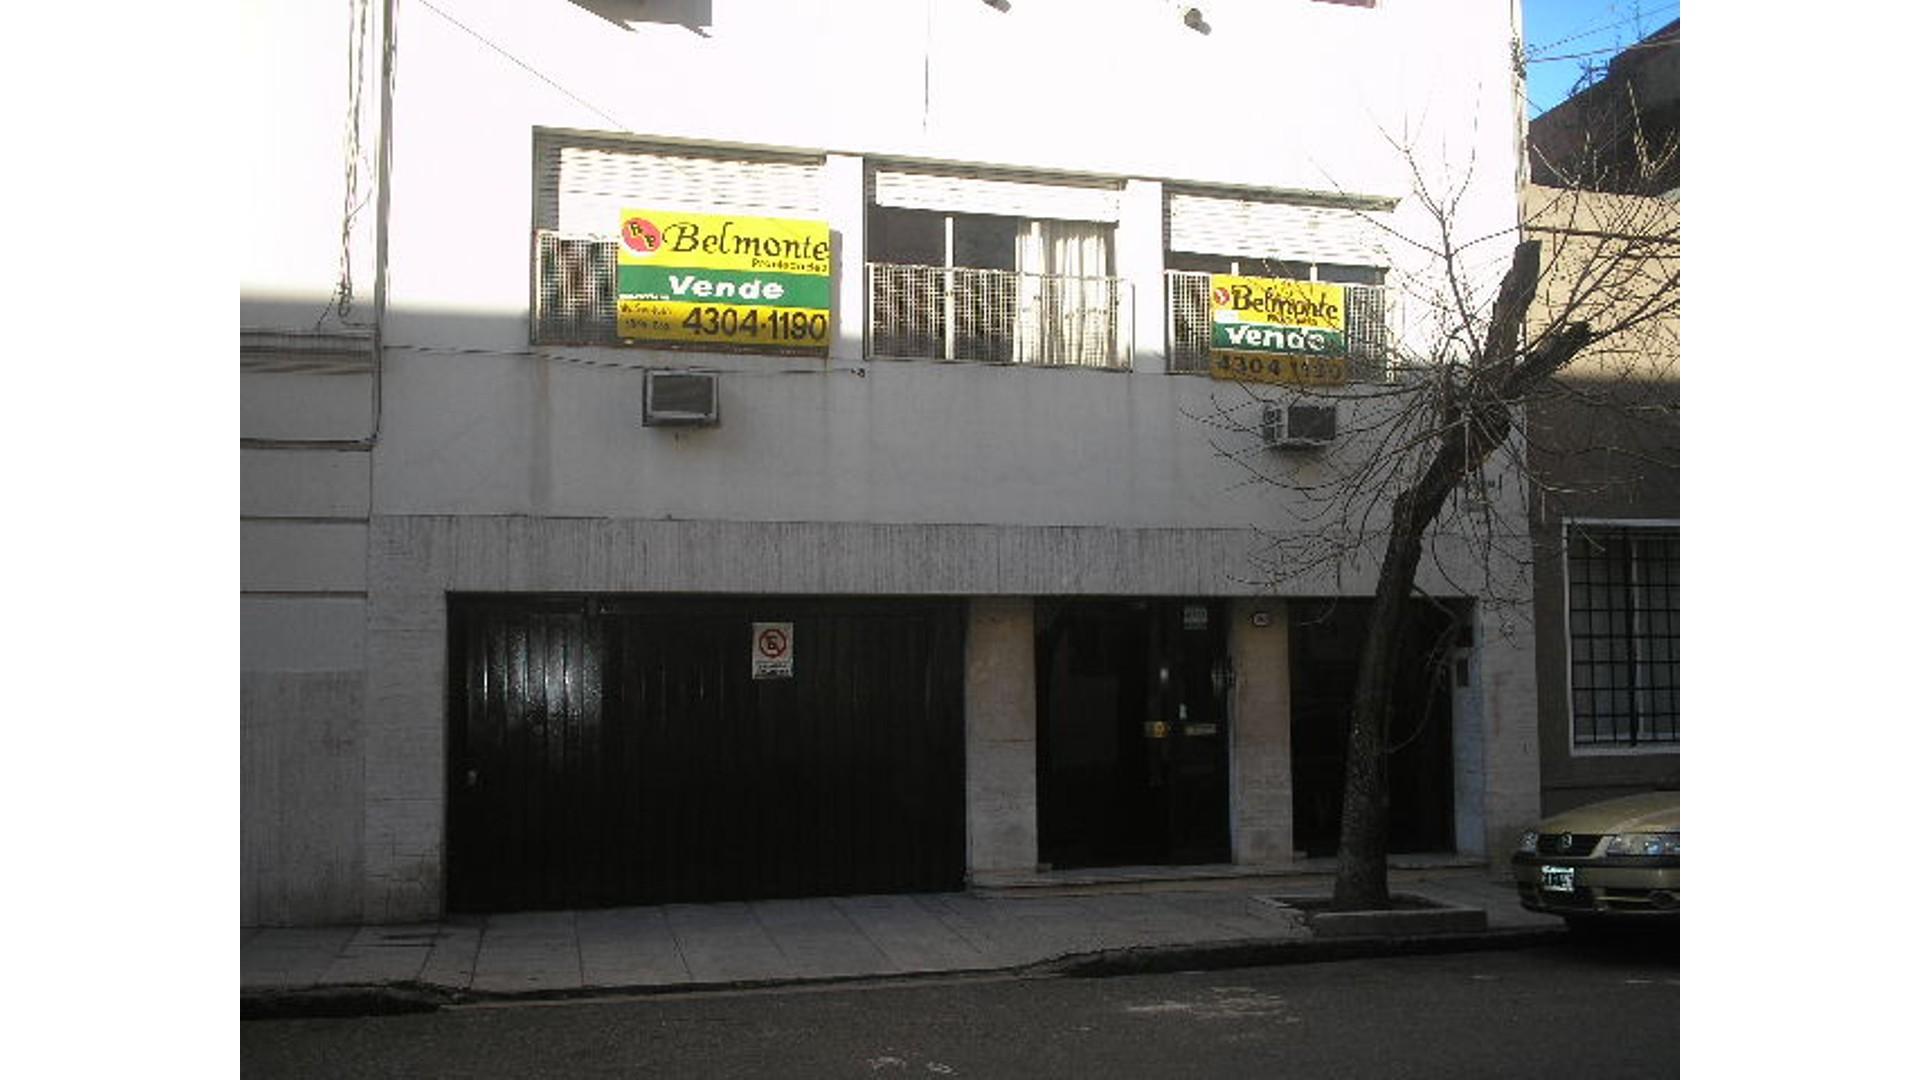 REGIO SEMI-PISO DE 3 AMB. AL FRENTE - MUY LUMINOSO - CERCA DE AVENIDAS...